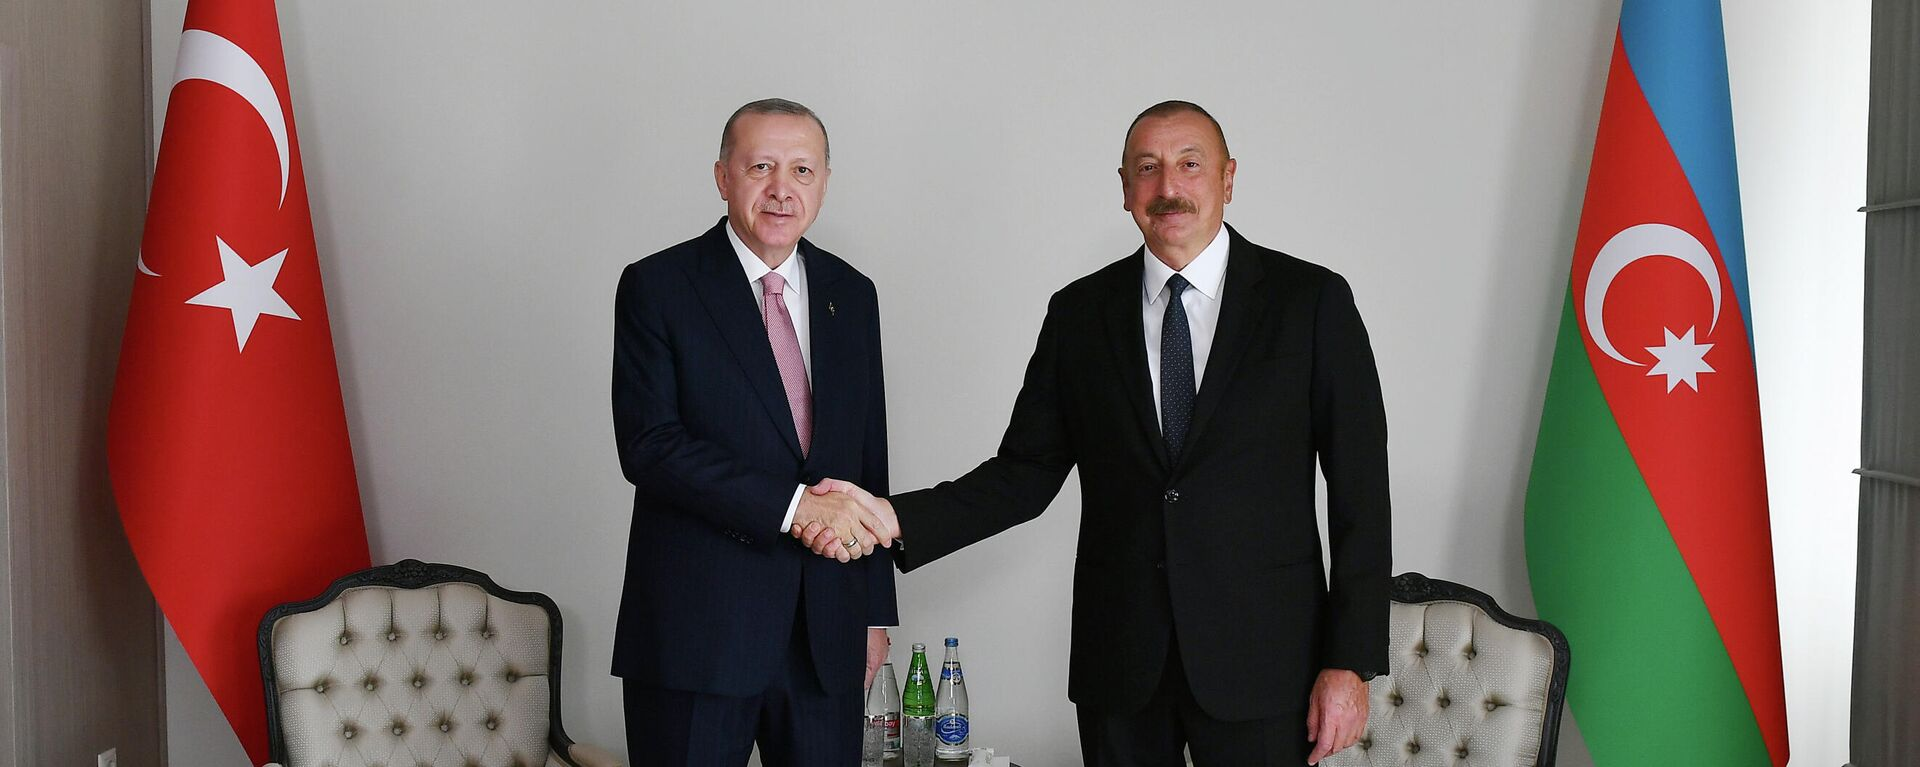 Recep Tayyip Erdogan, el presidente de Turquía (izqda.), con su homólogo azerí, Ilham Iliyev  (dcha.)  - Sputnik Mundo, 1920, 16.06.2021